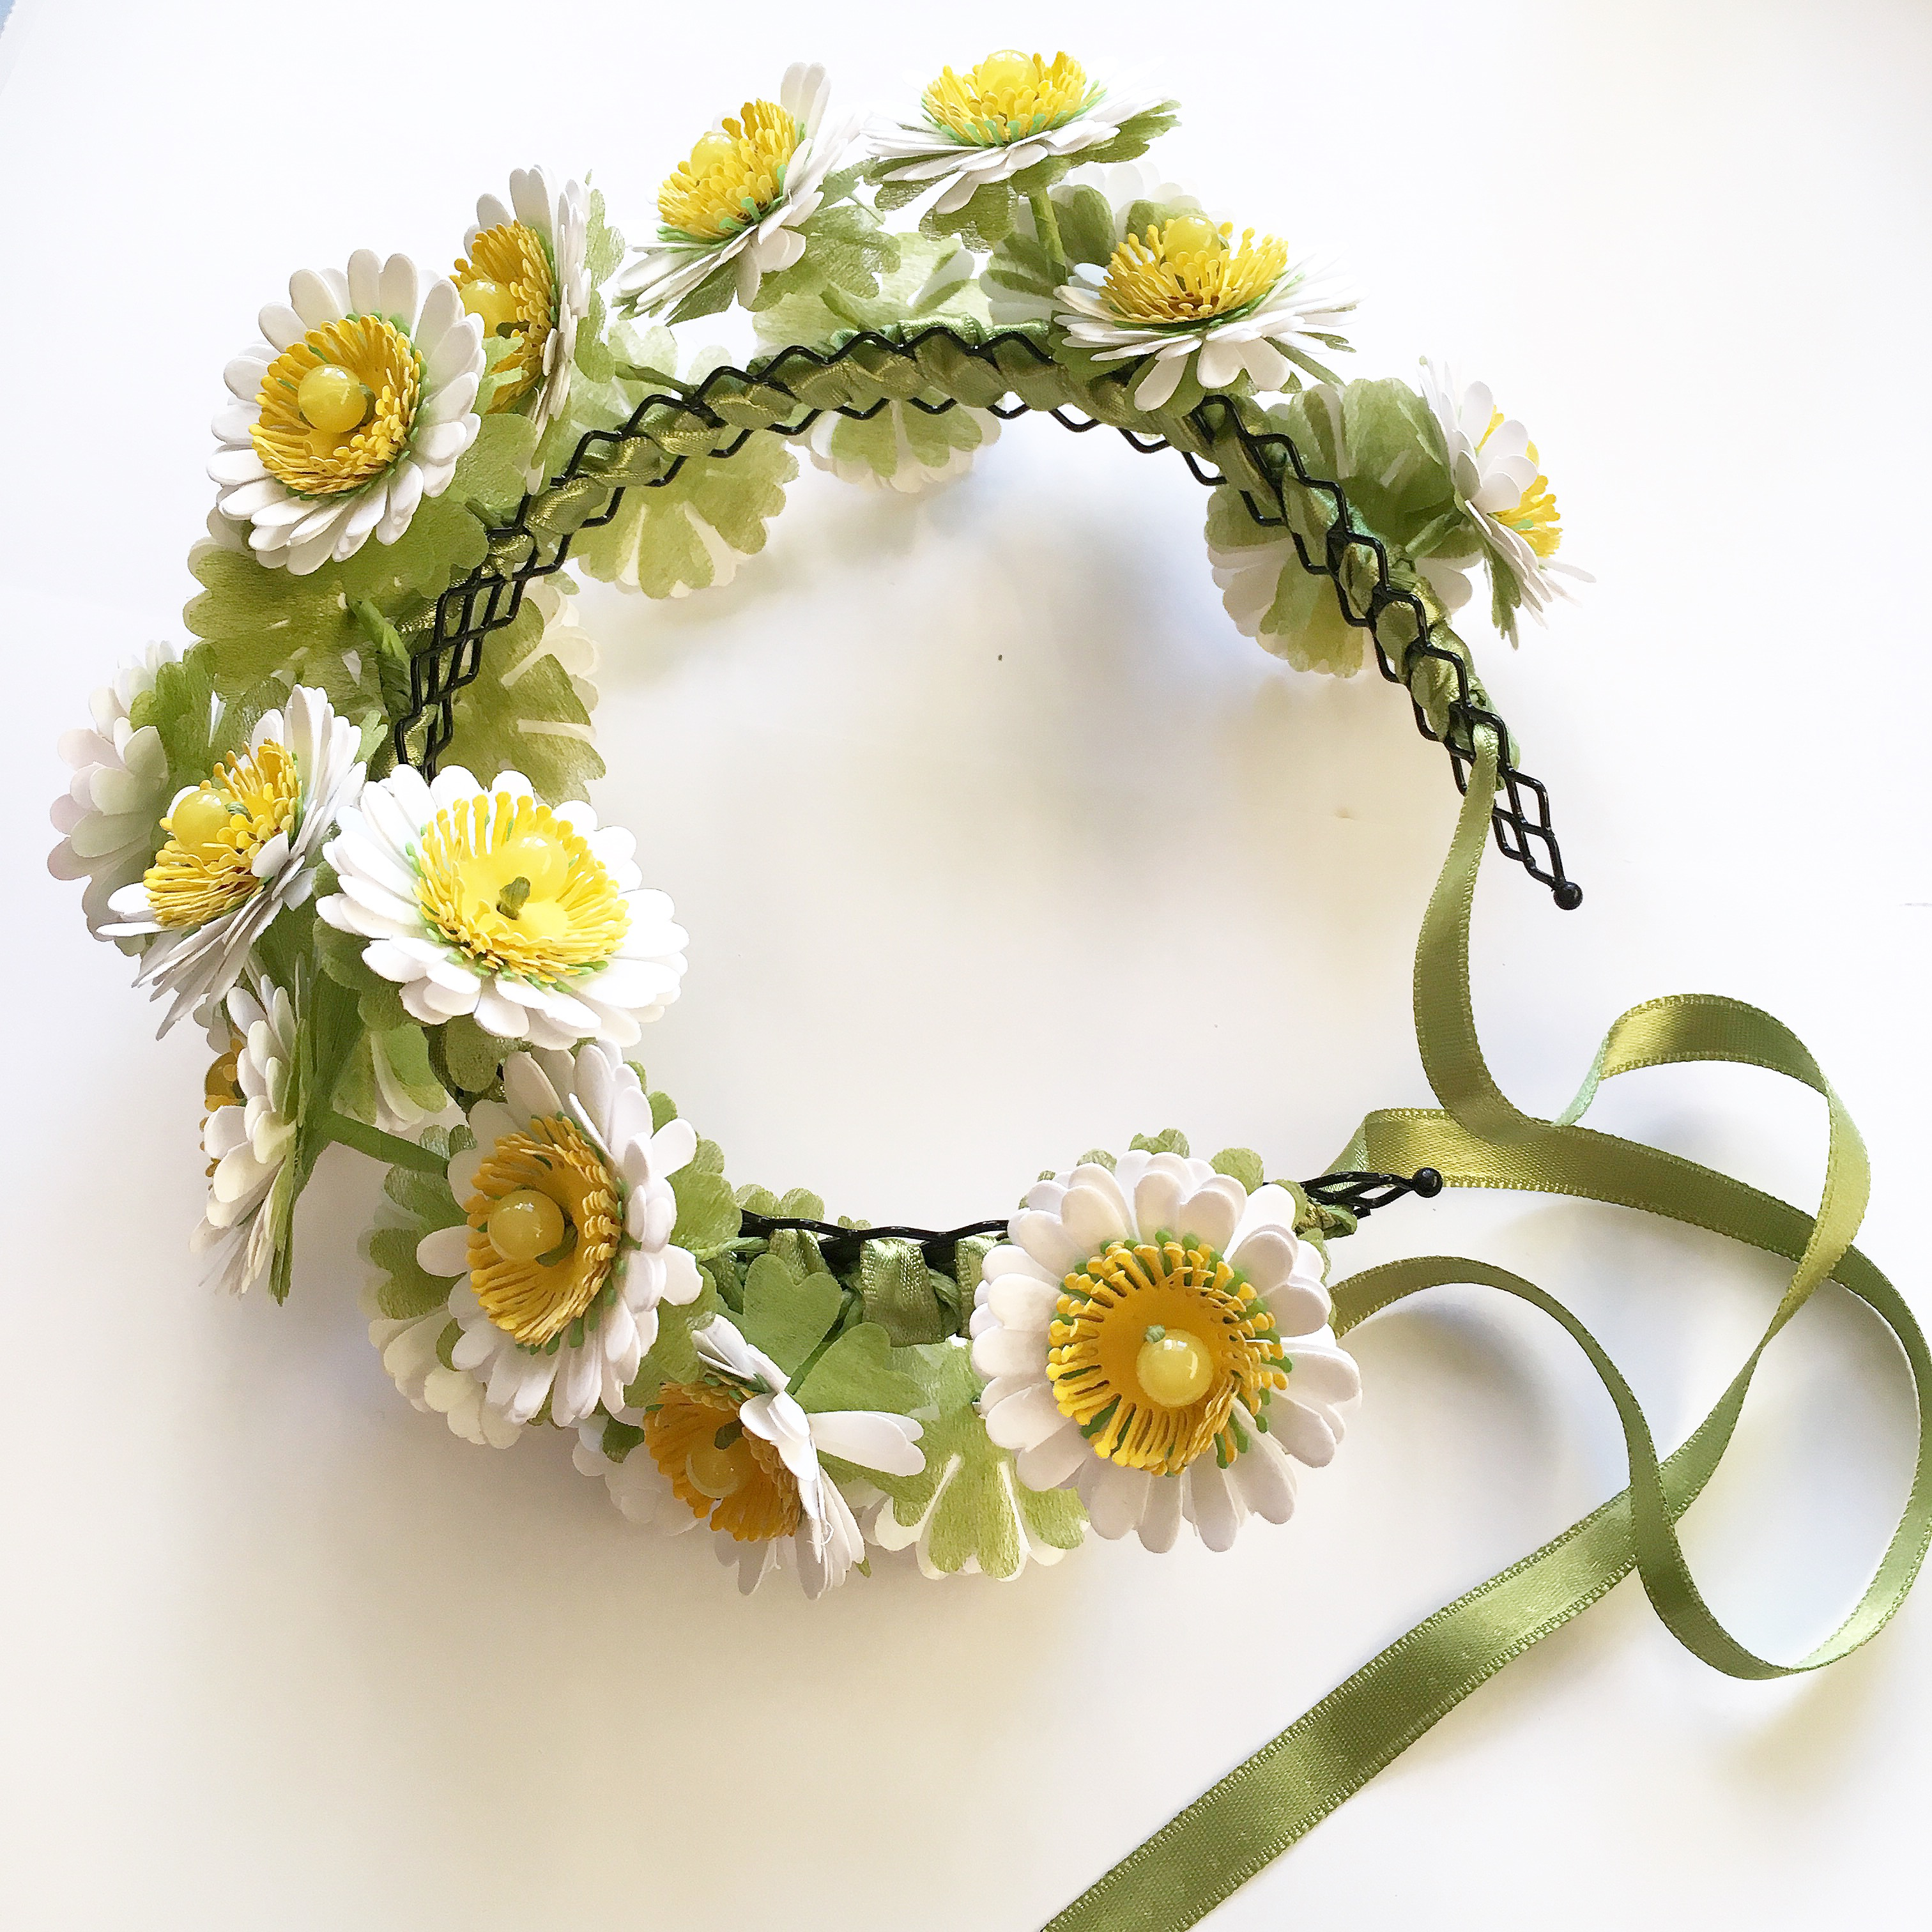 Everlasting Daisy chain